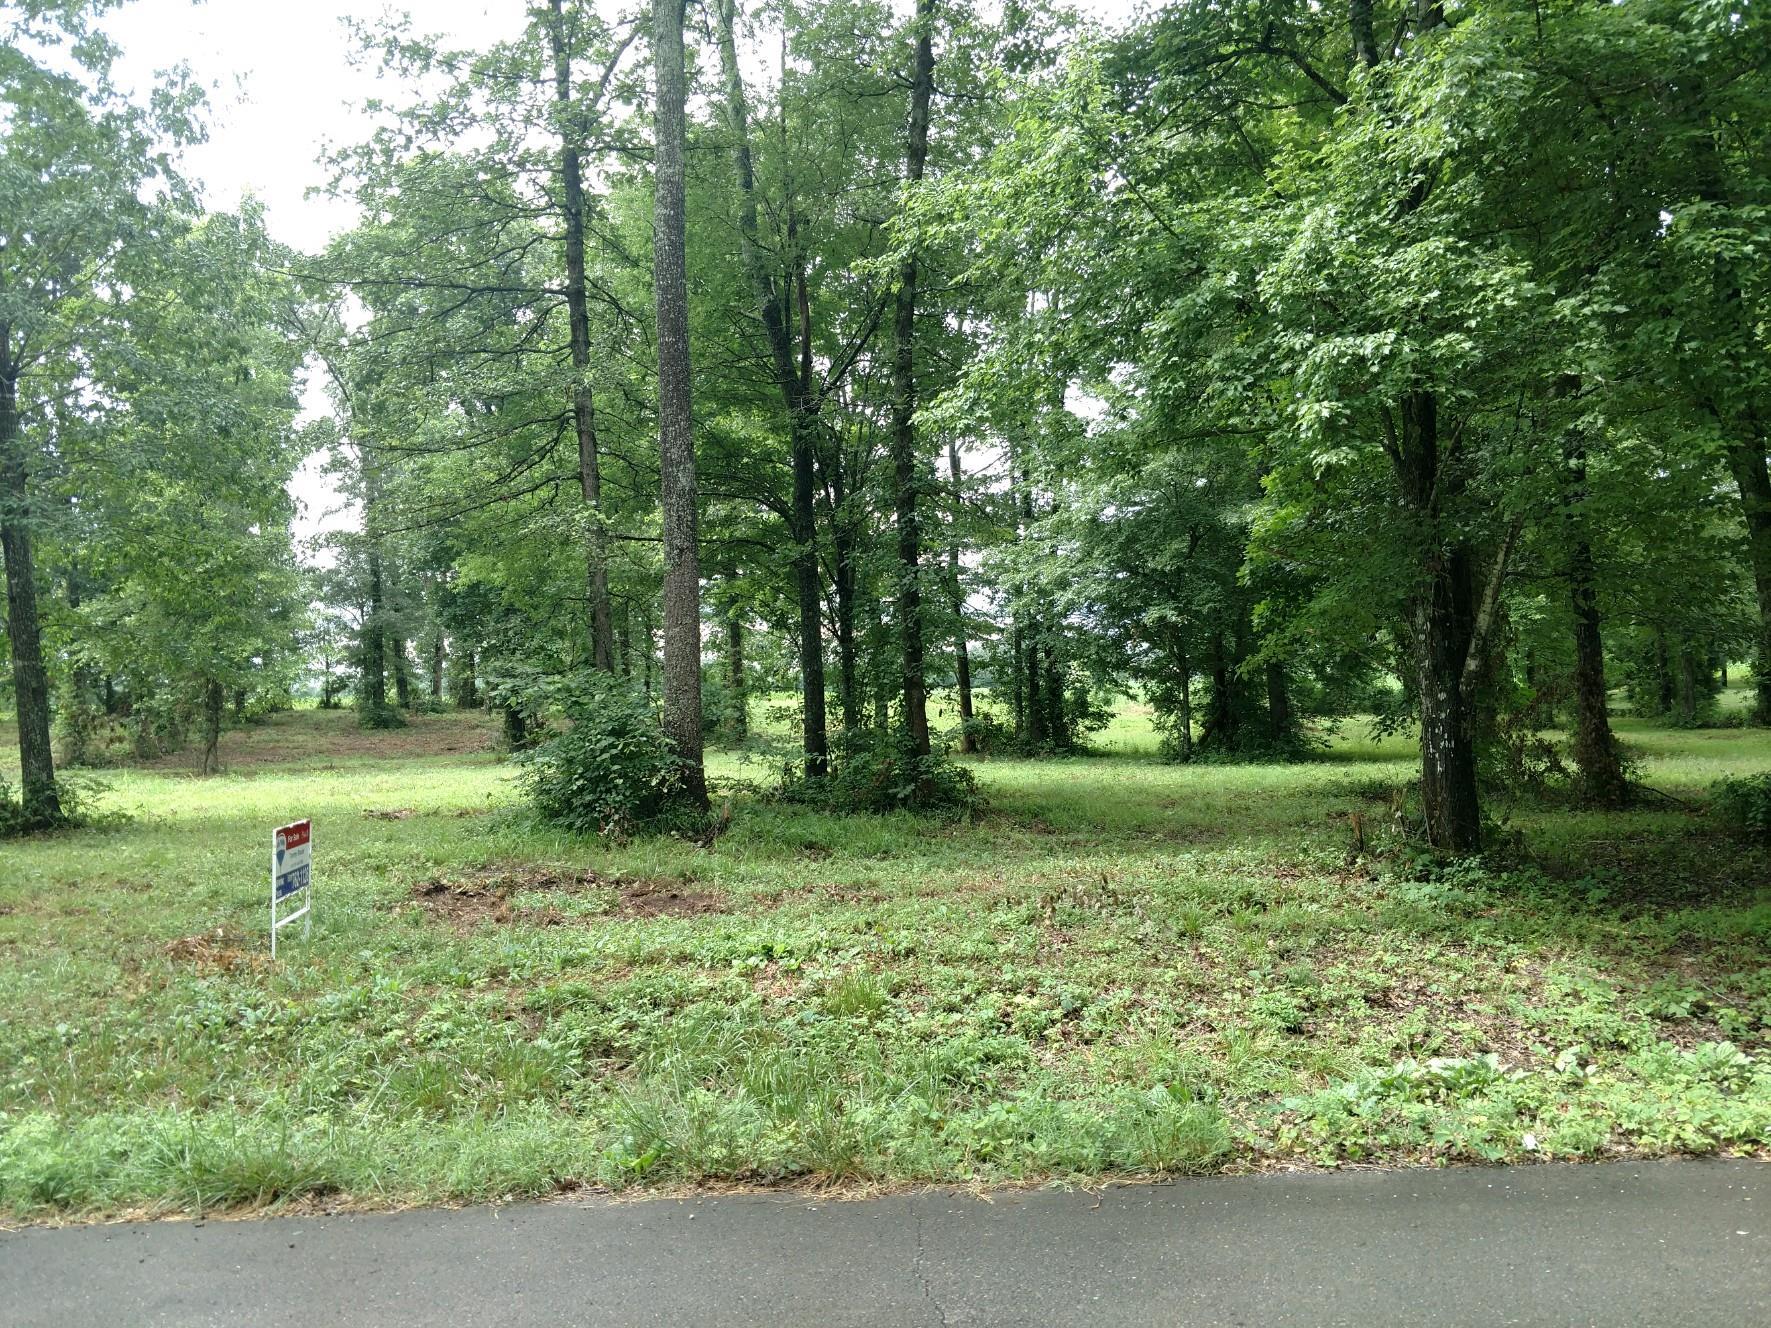 0 Woodland Cir, Lawrenceburg, TN 38464 - Lawrenceburg, TN real estate listing